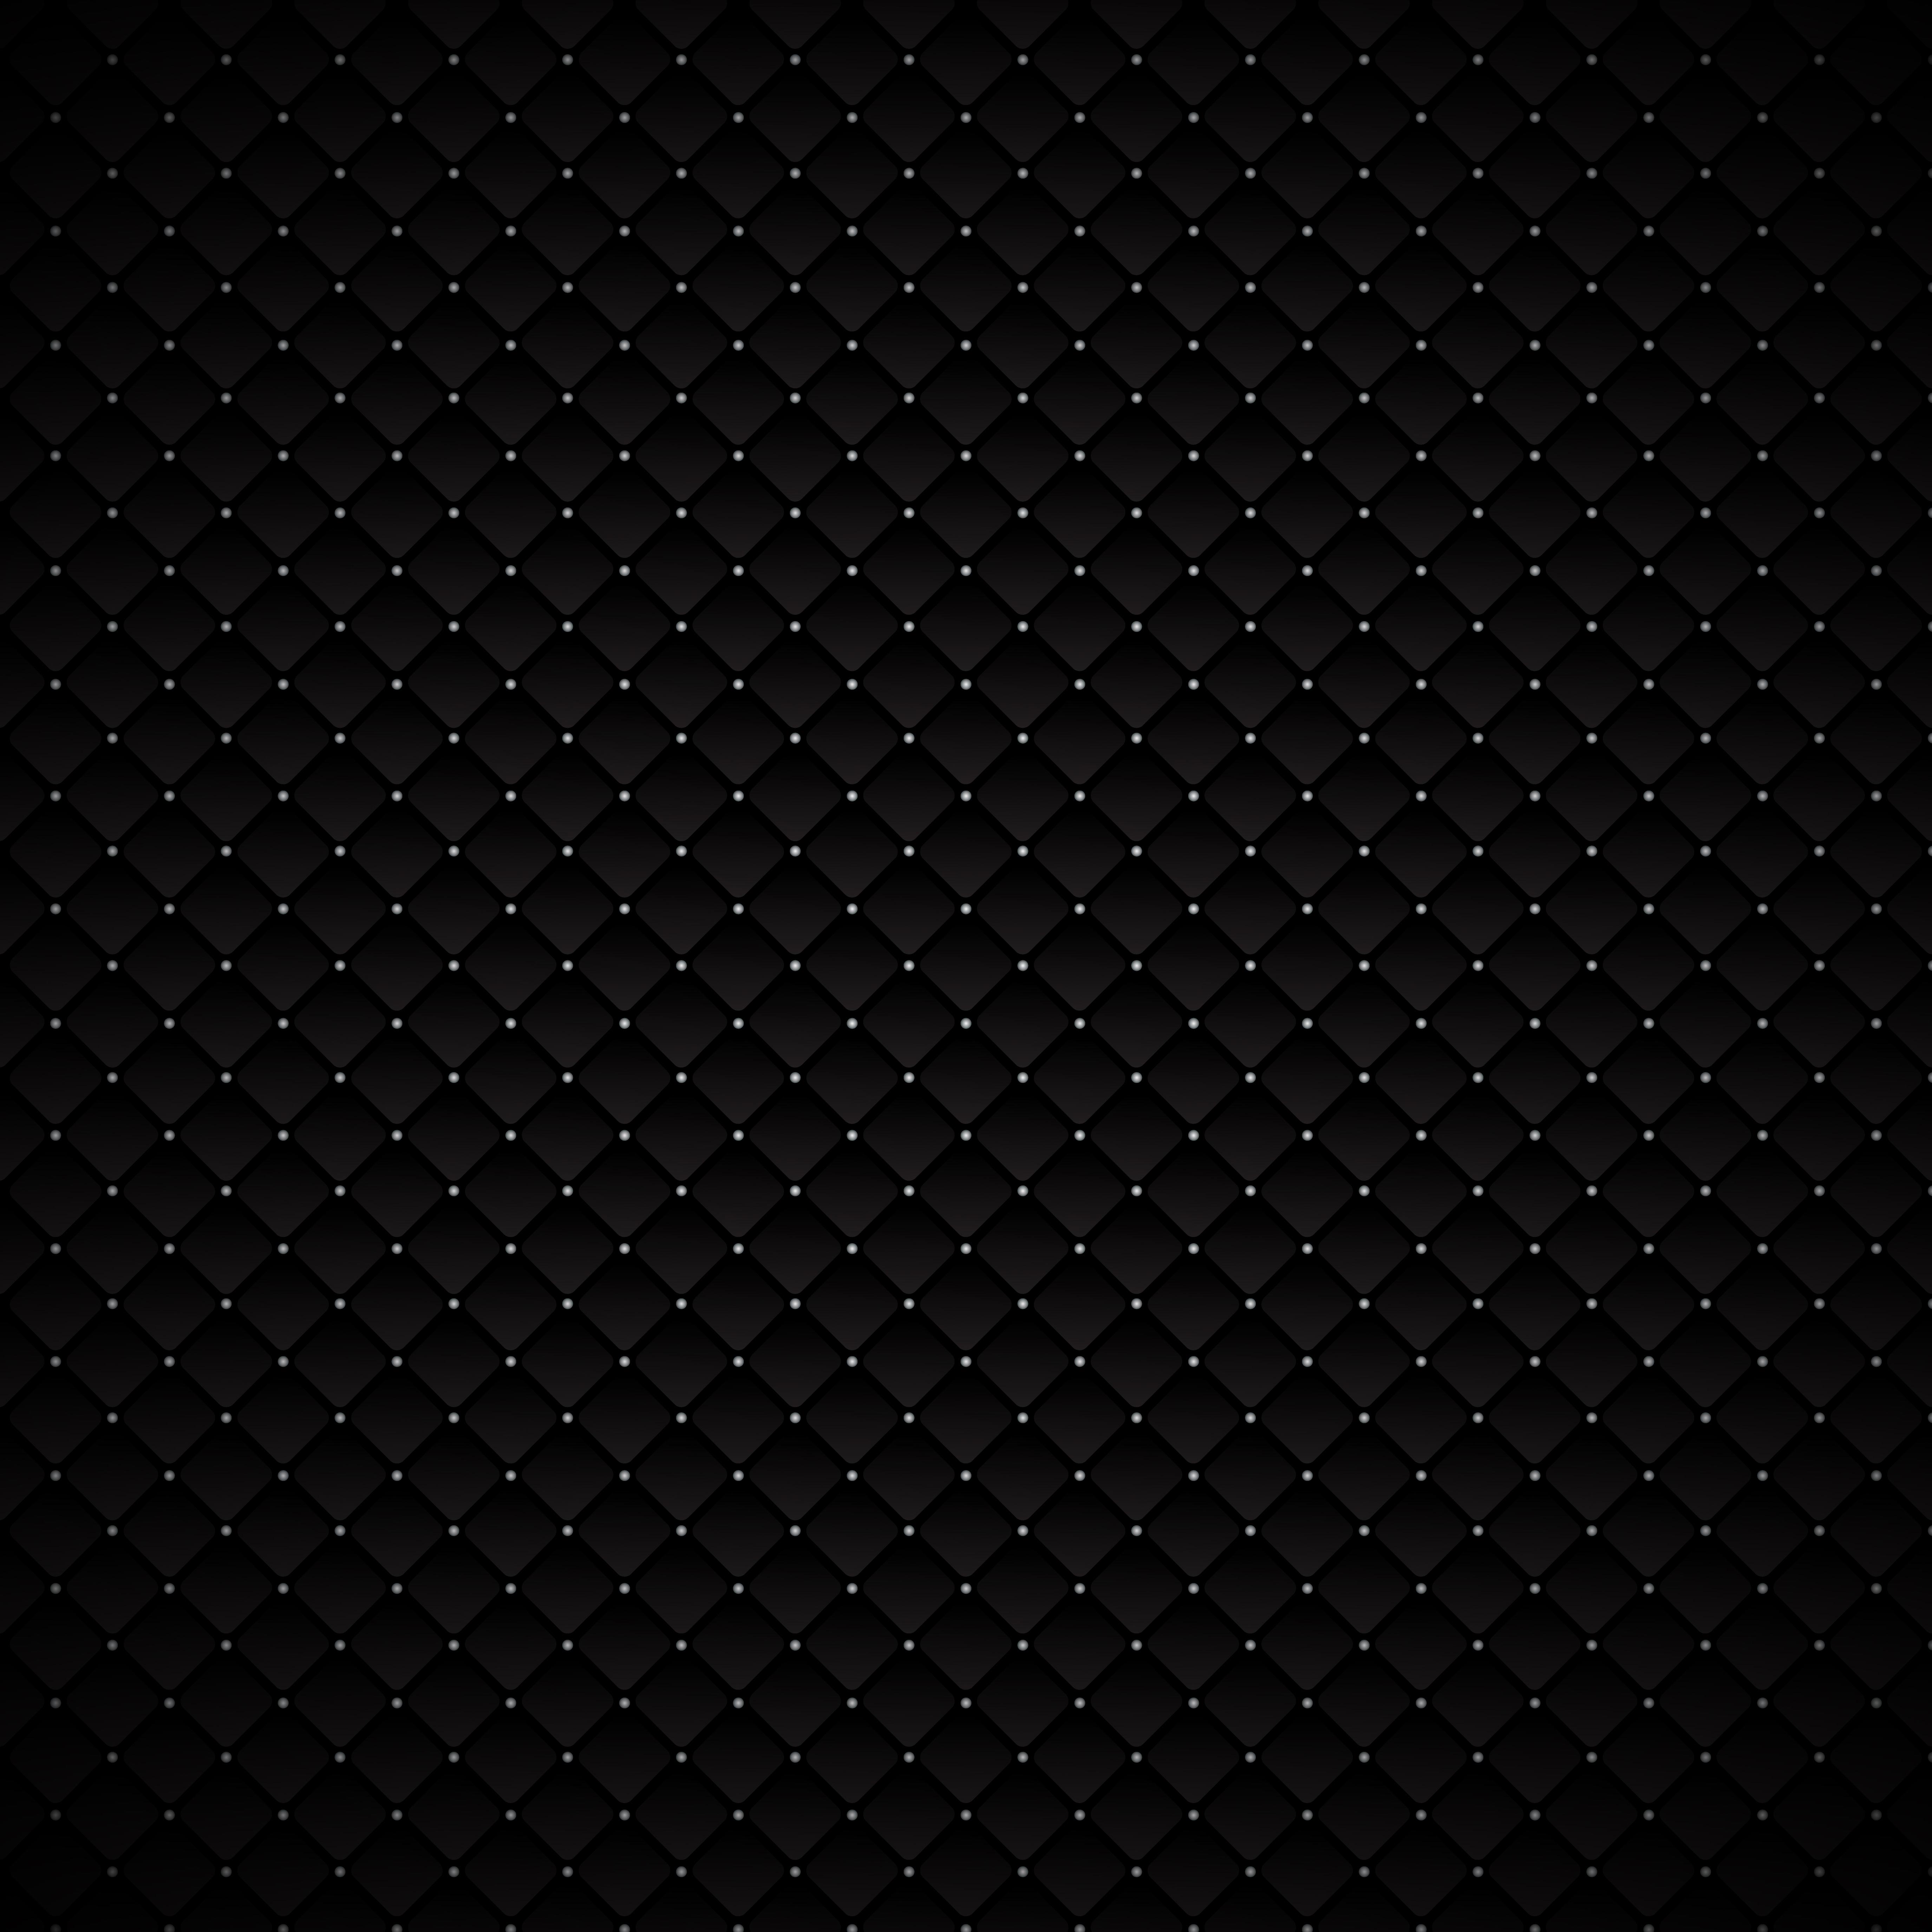 Abstract Luxury Black Geometric Squares Pattern Design